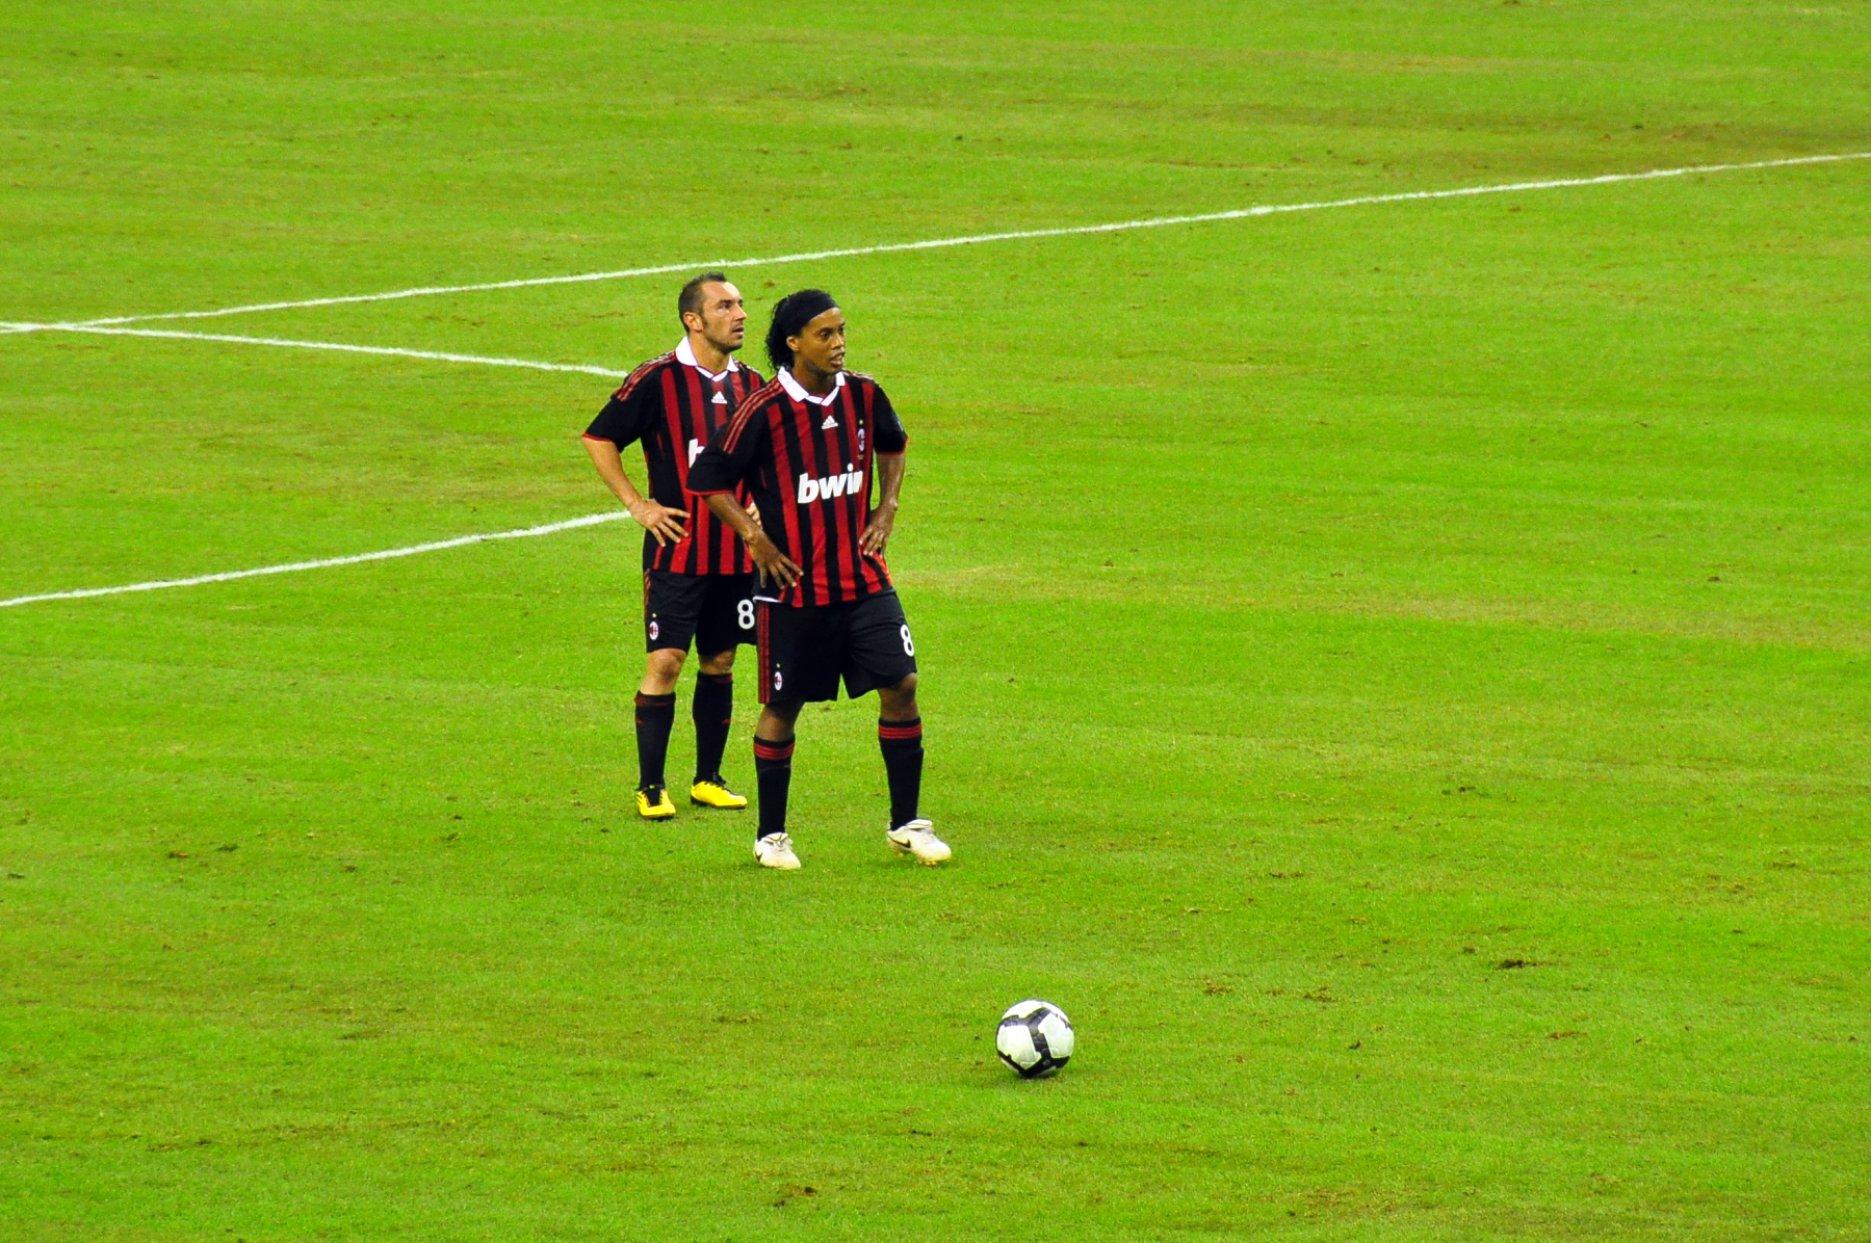 Ronaldinho Free Kick Wallpaper Hình Nền